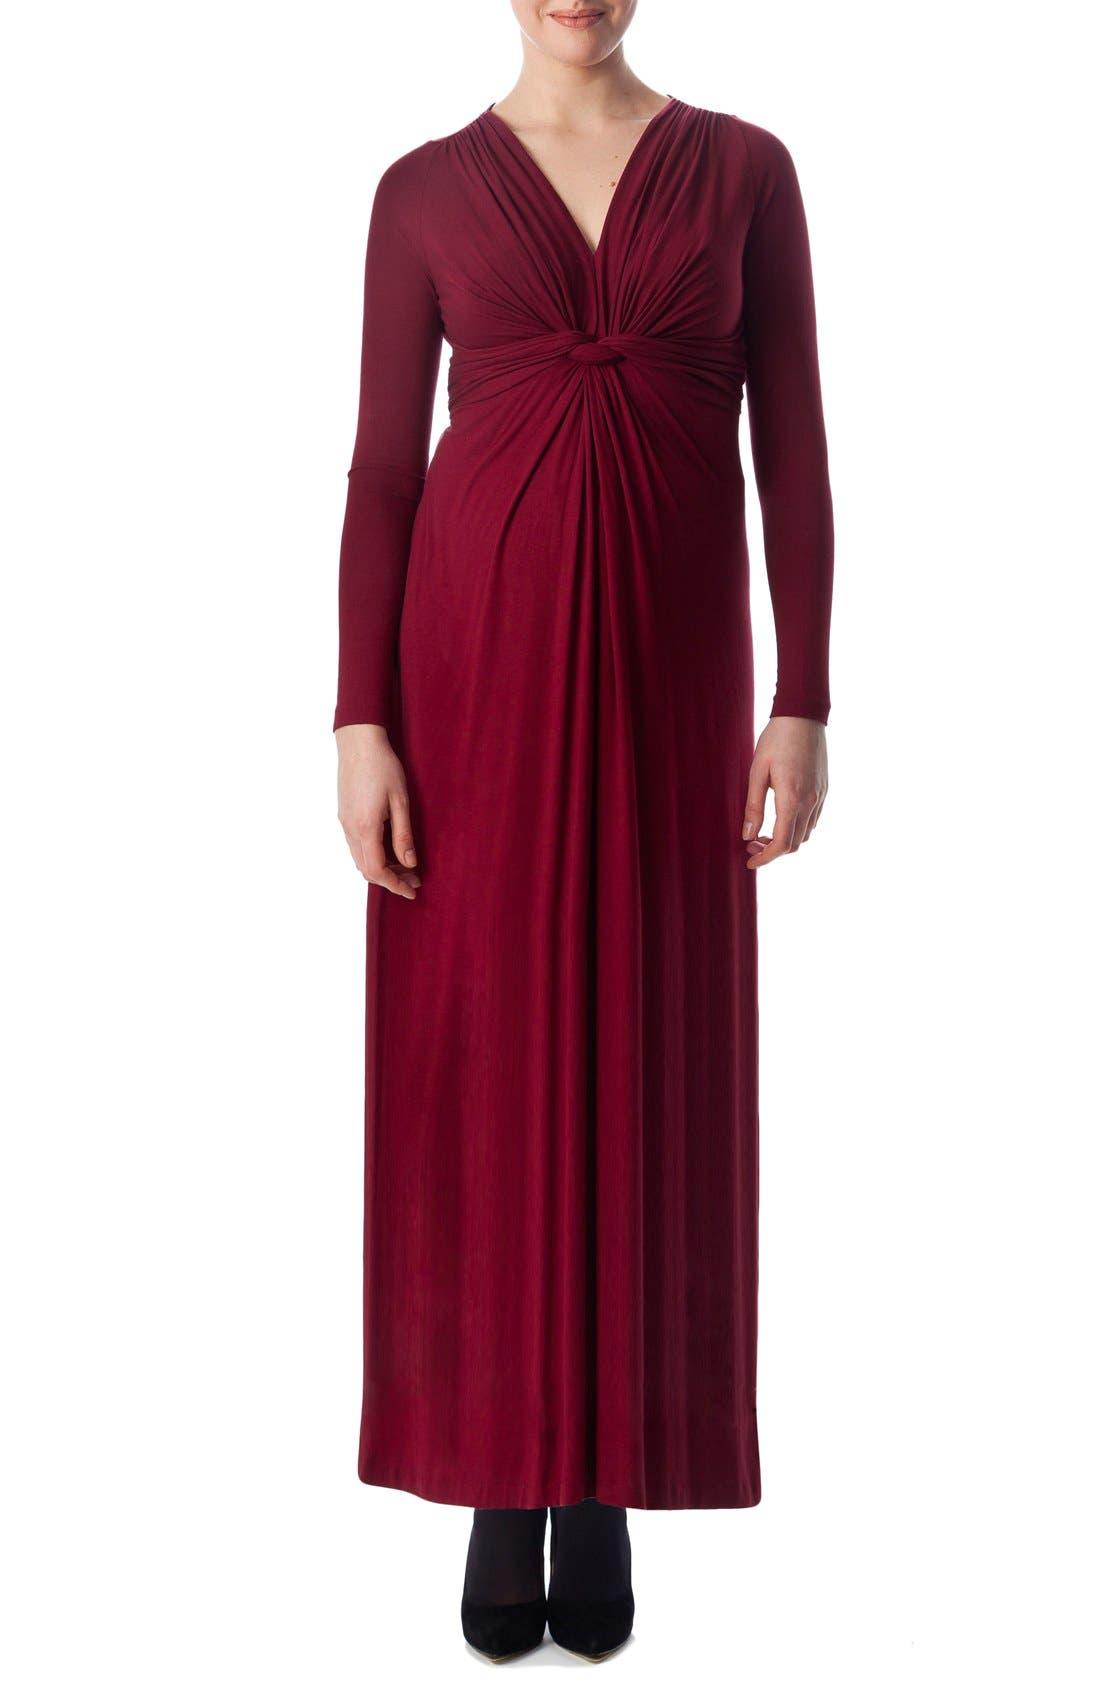 Madonna Maternity Maxi Dress,                         Main,                         color, Ruby Wine